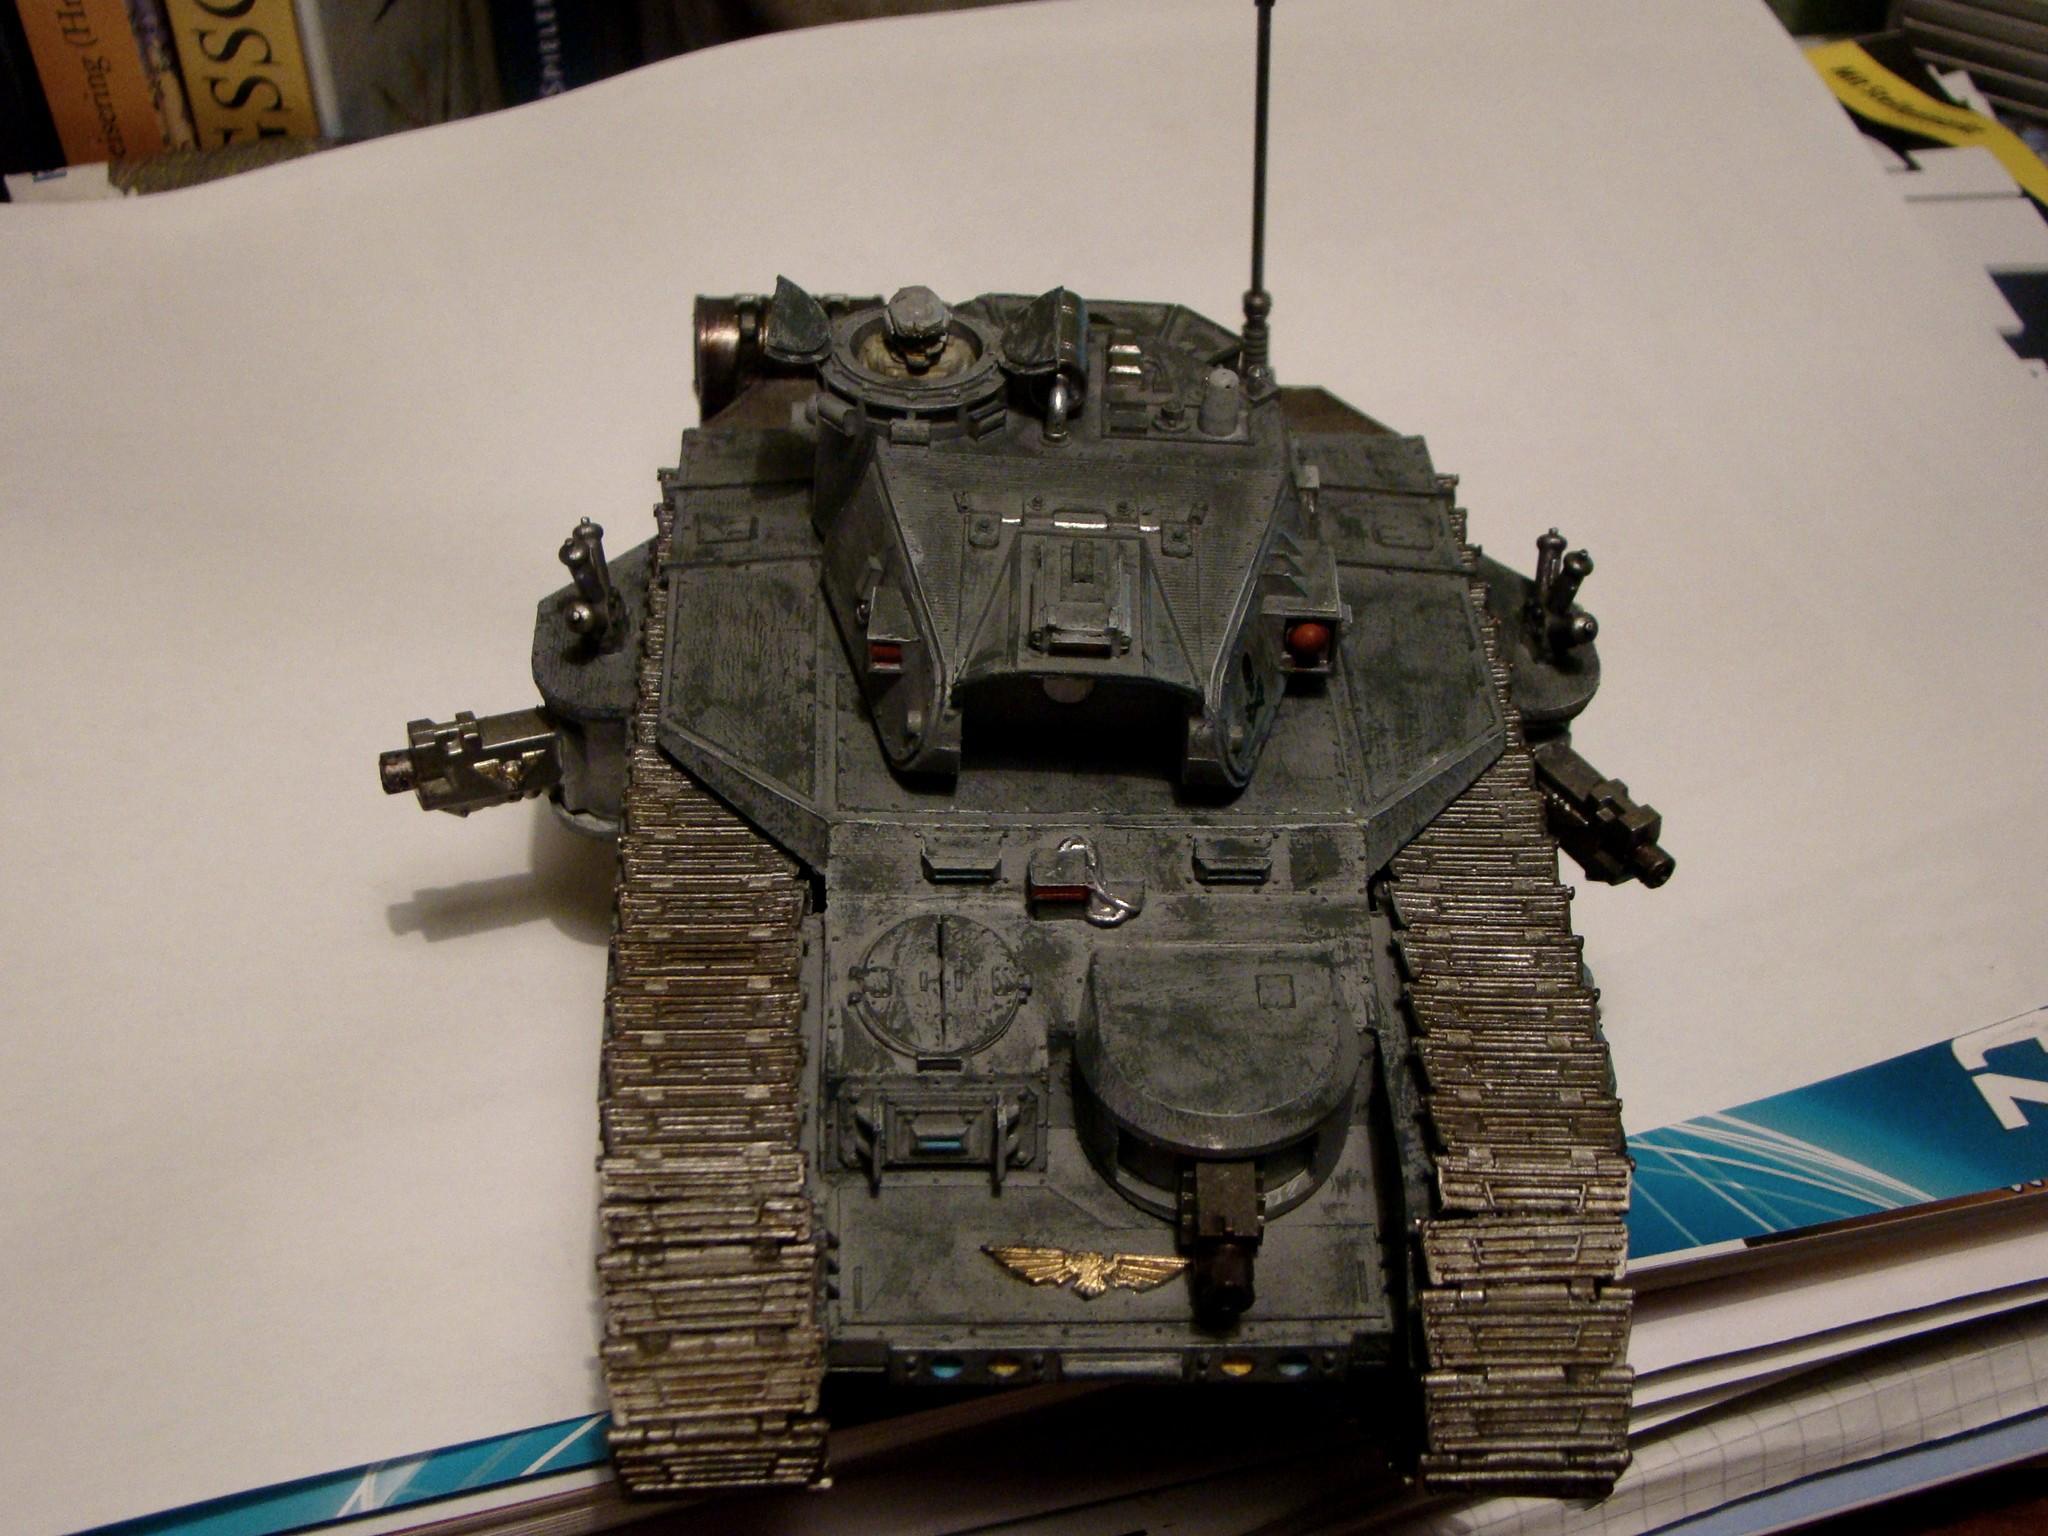 Imperial Guard, Tank, Warhammer 40,000